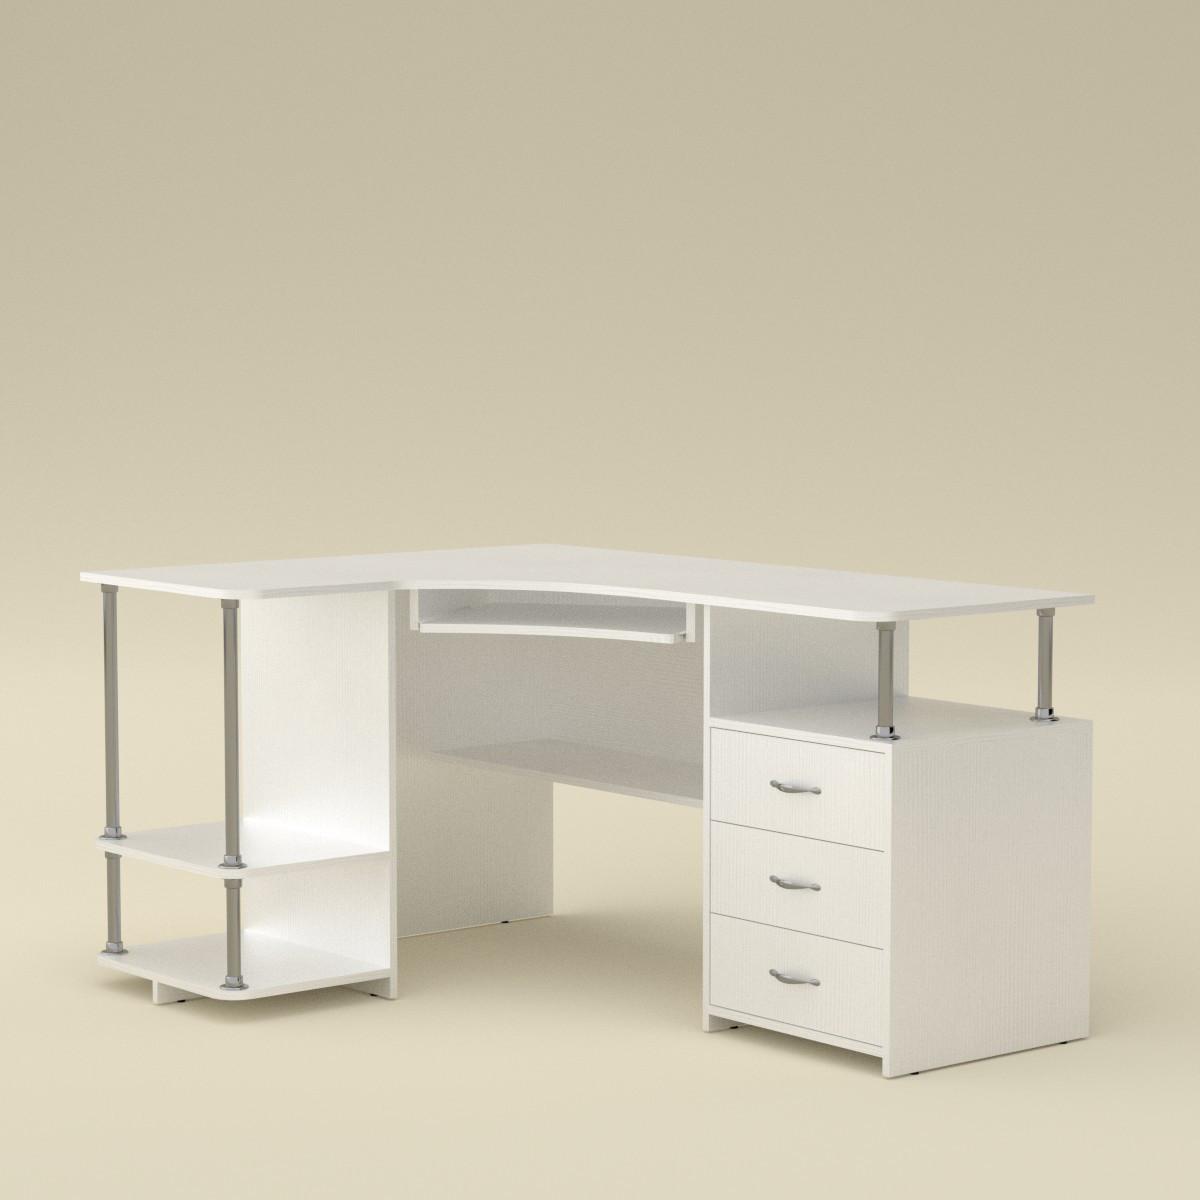 Стол компьютерный СУ-4 (кромка АБС - 2мм) белый Компанит (150х110х77 см)